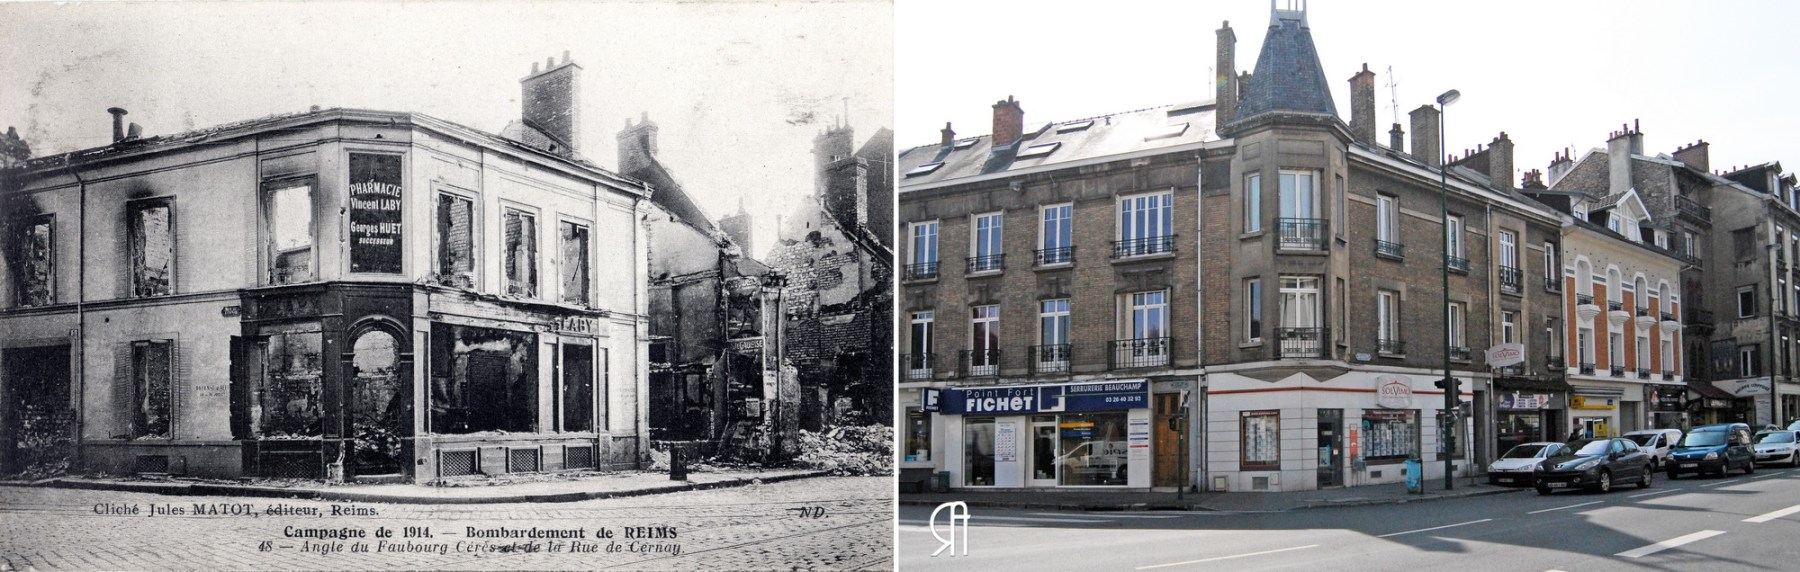 Angle de la rue Jean-Jaurès et de la rue de Cernay